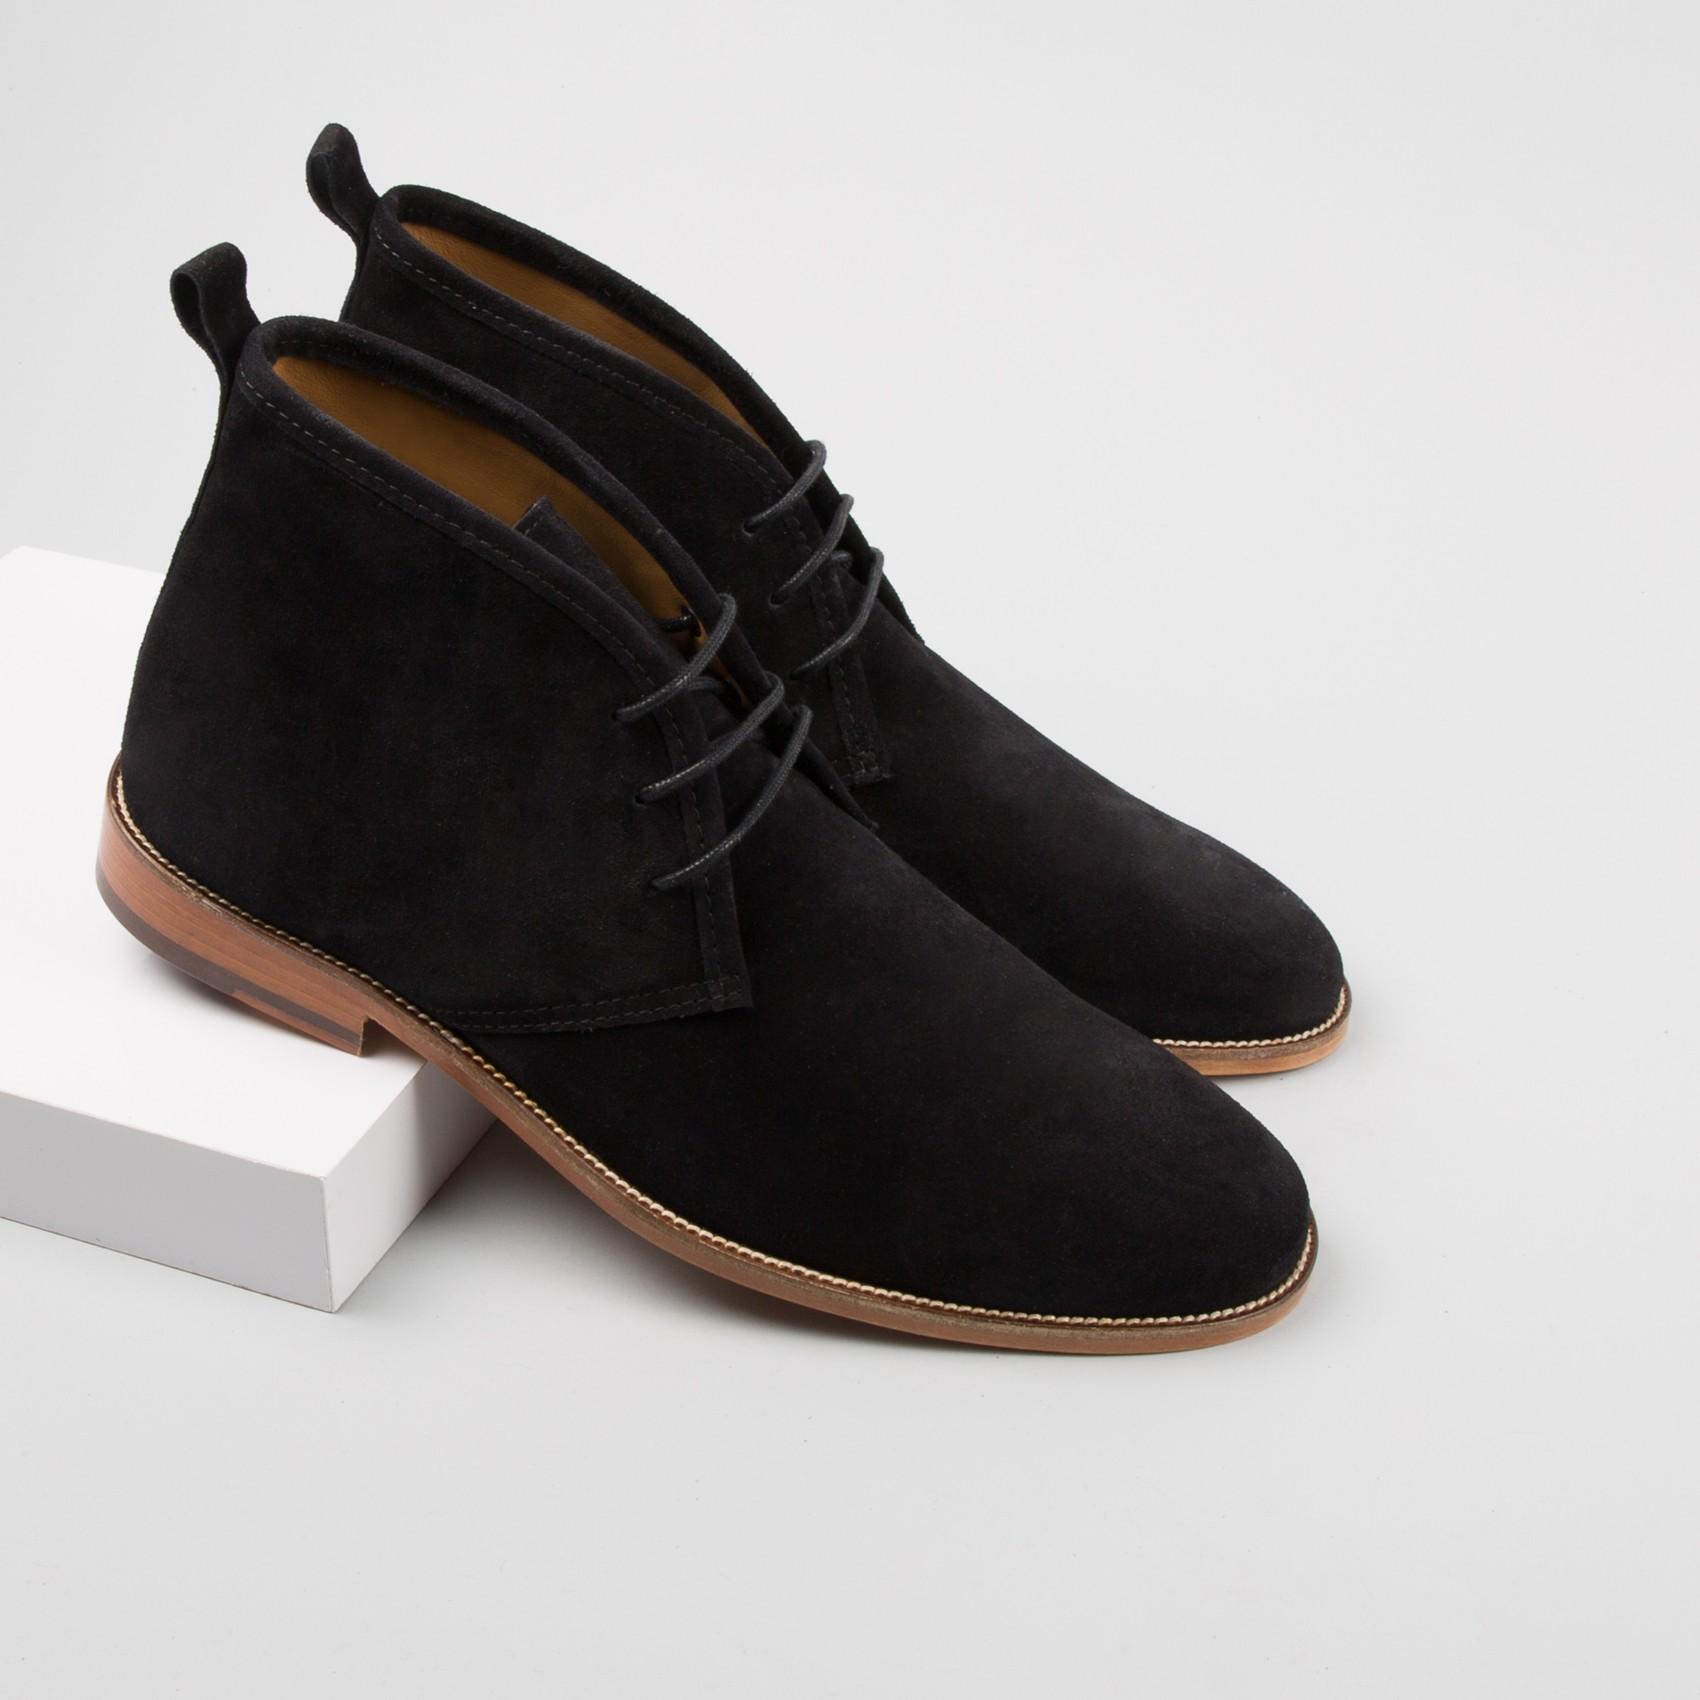 Mens Chukka Boots Black